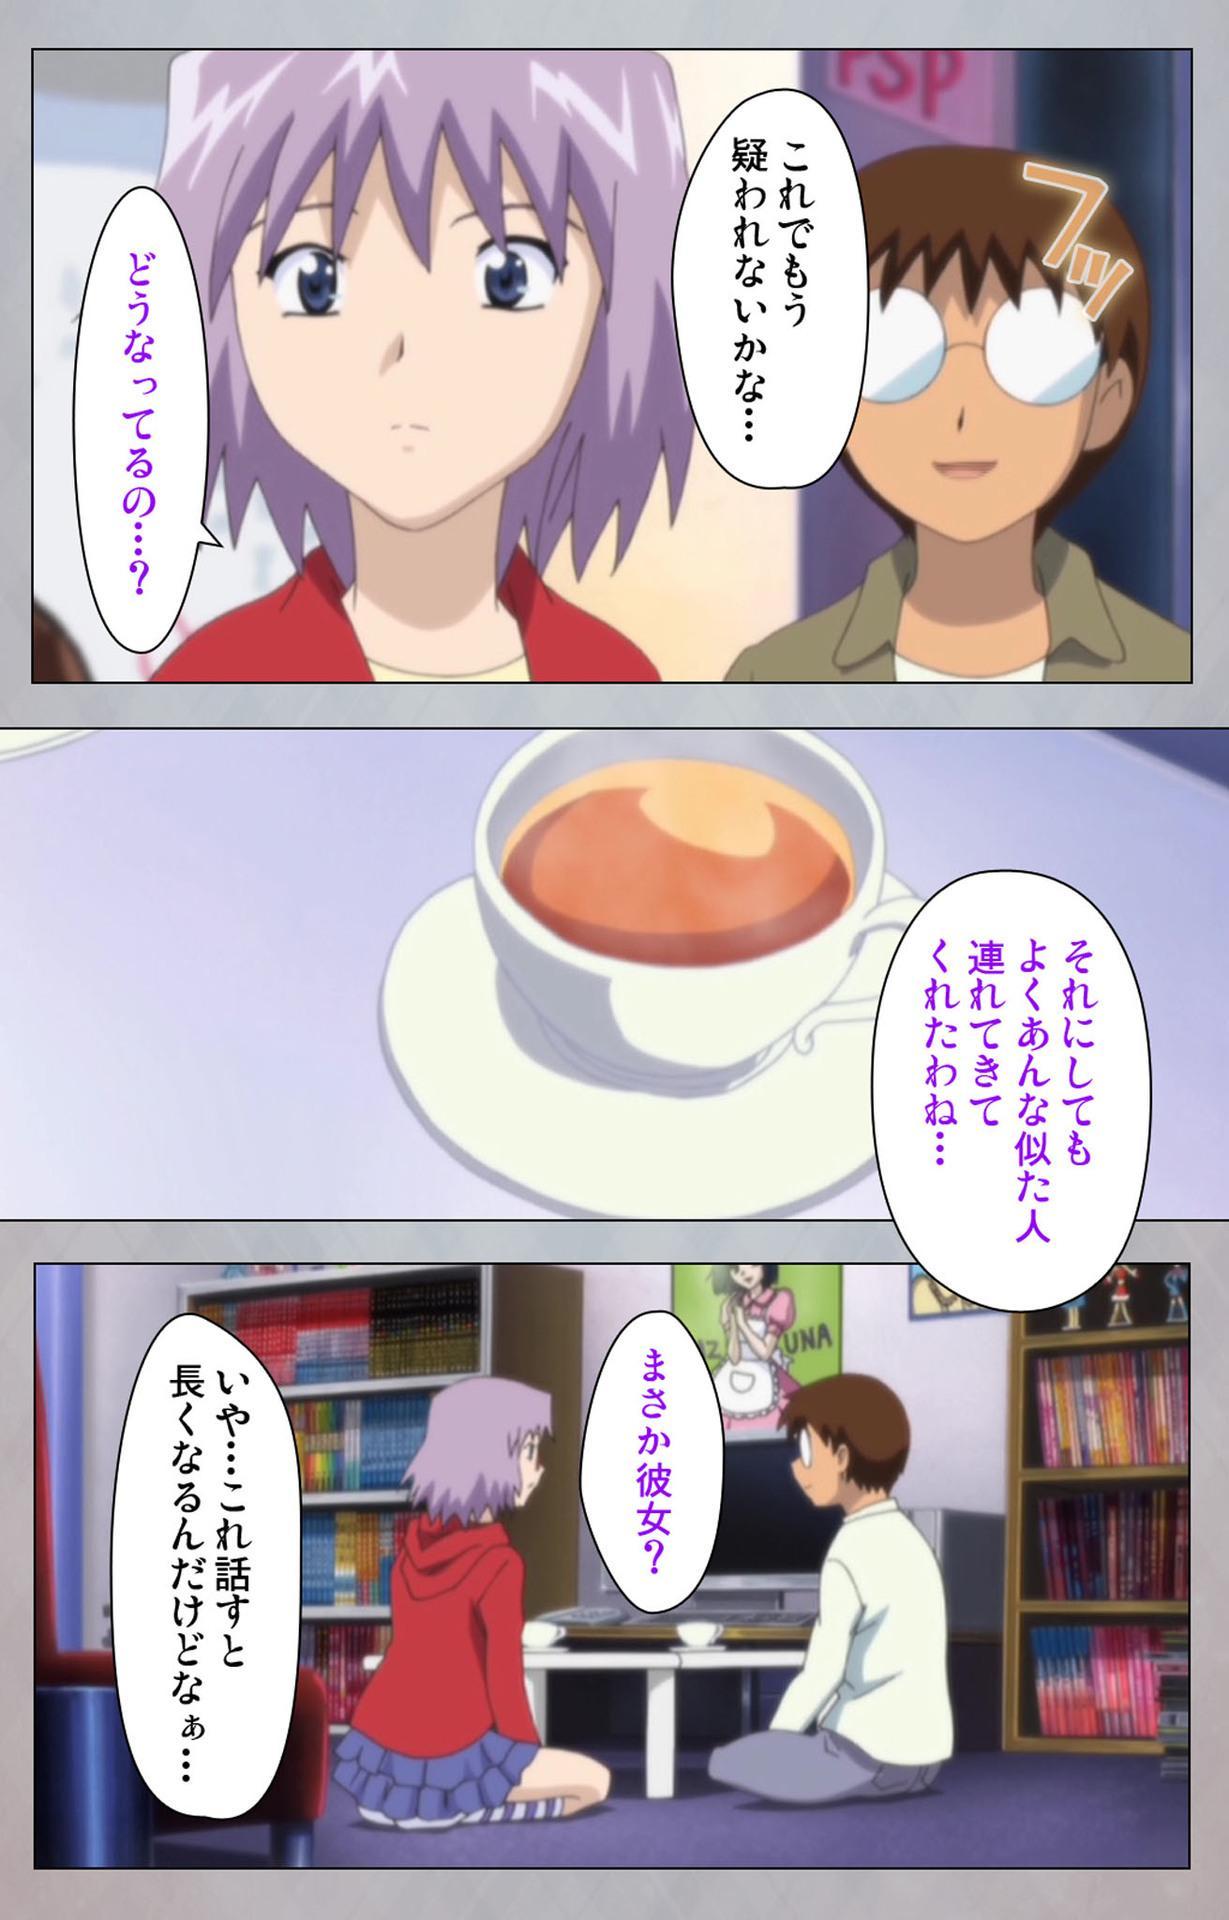 [Digital Works] [Full Color Seijin Ban] Sex Android ~Risou no Onna de Nuite yaru~ Kanzenban 188